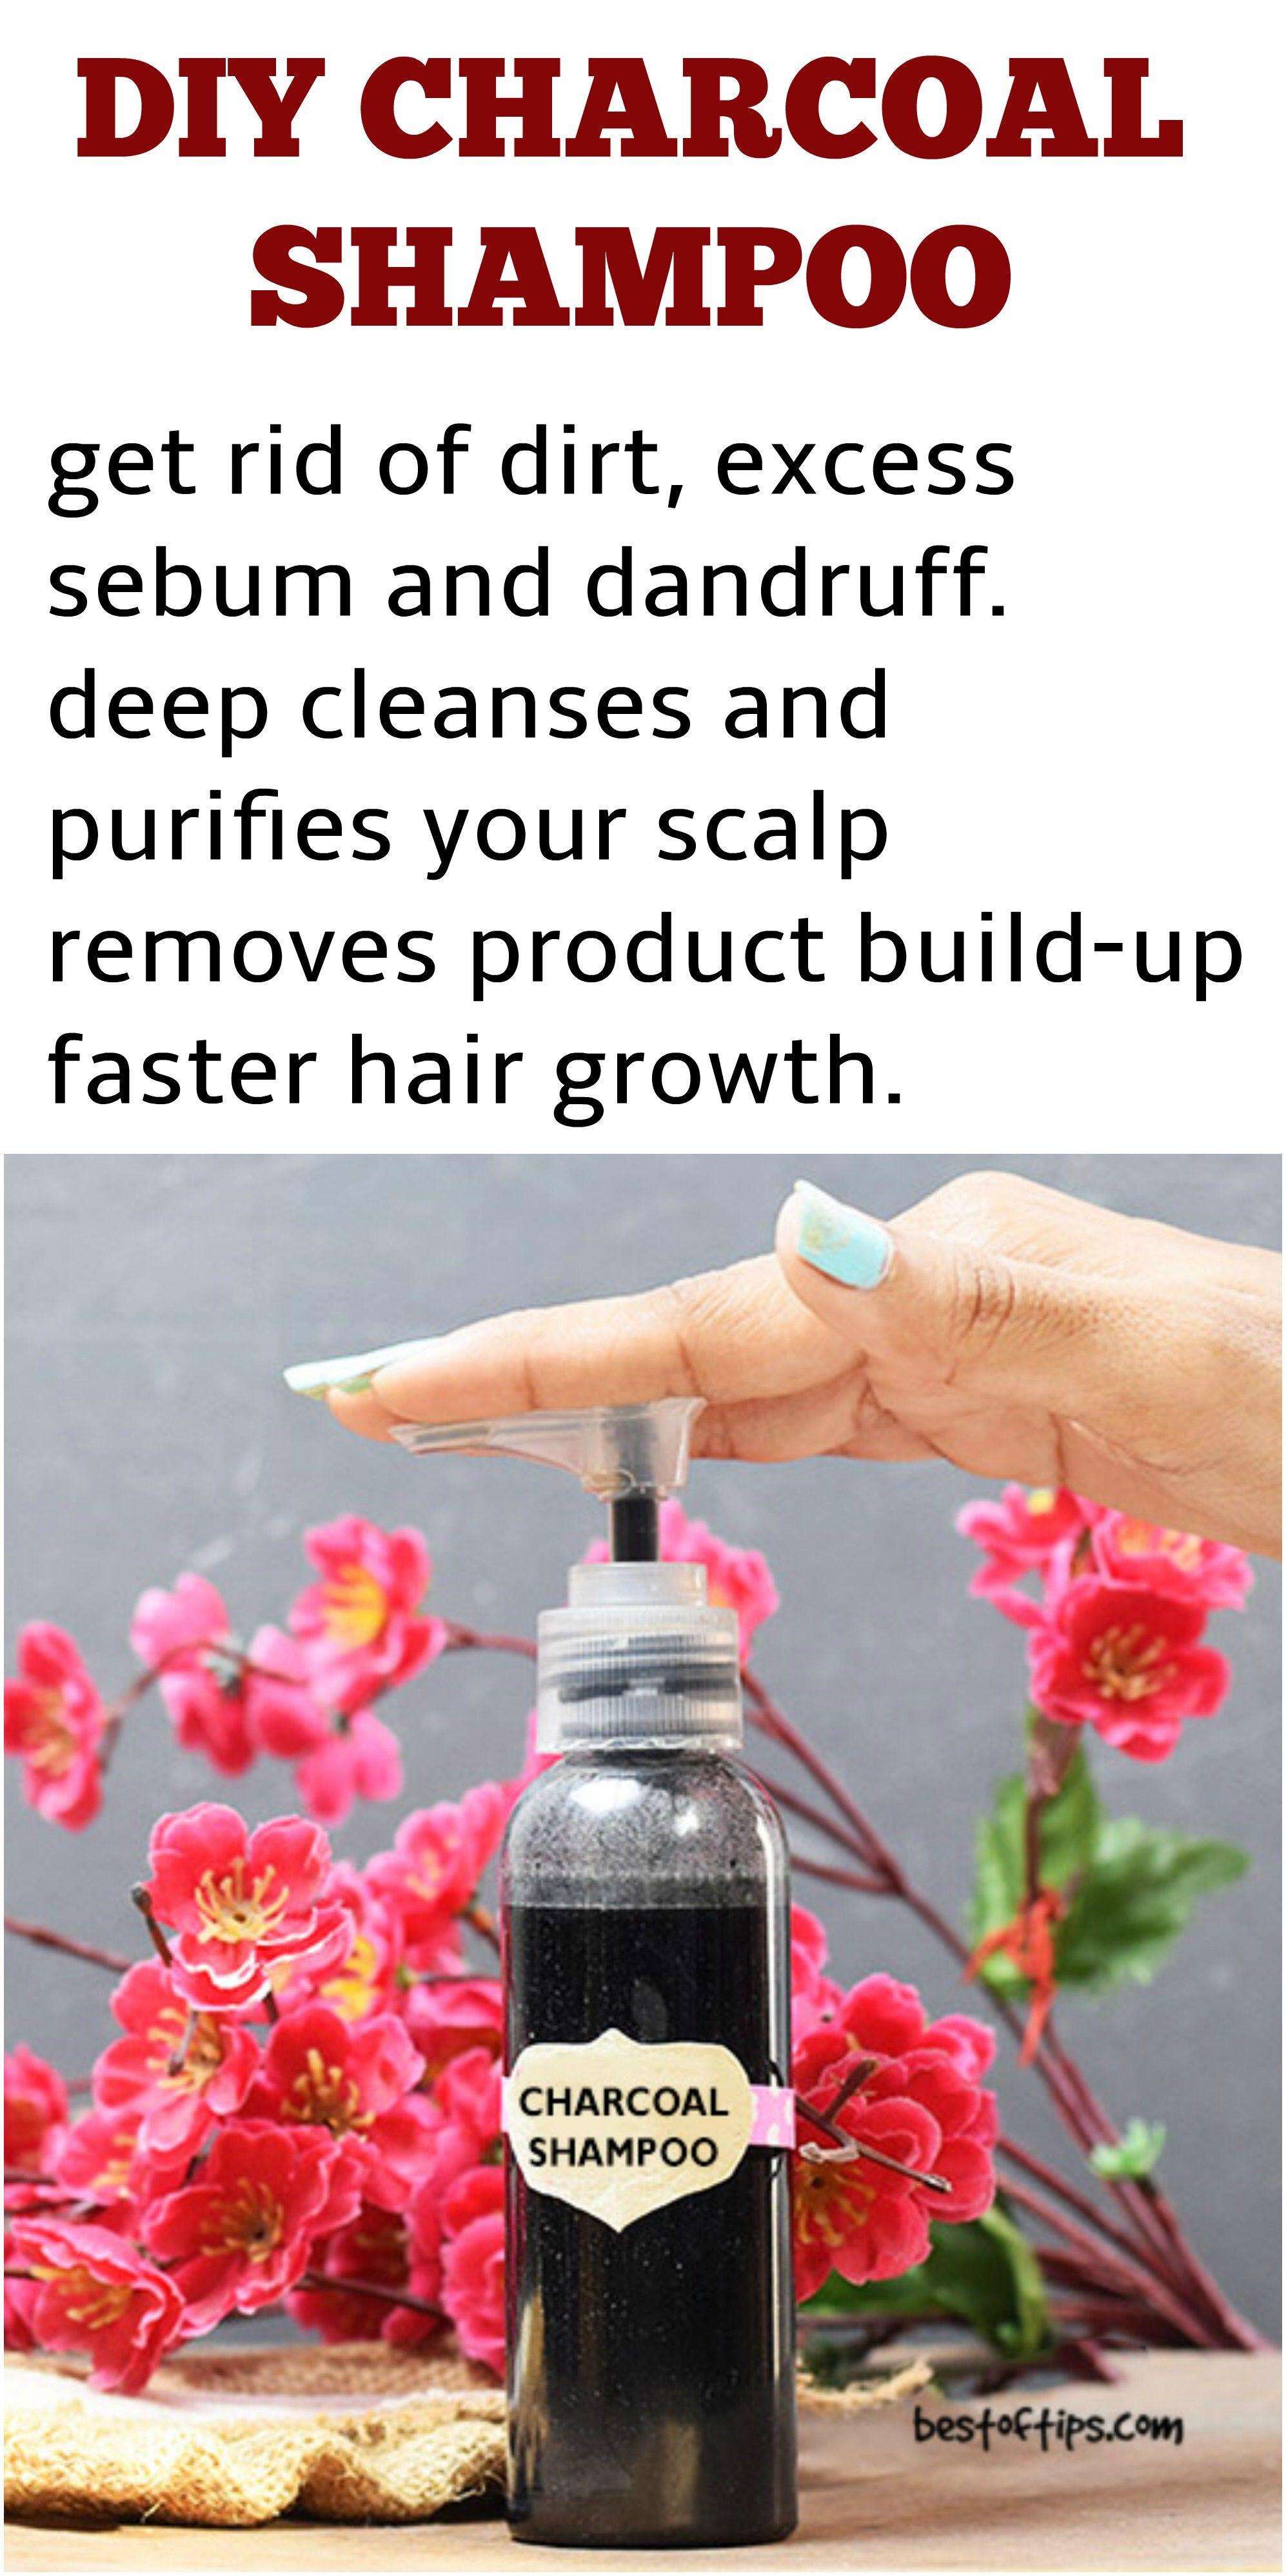 Charcoal Shampoo Diy Clean Hair Shampoo Charcoal Recipe